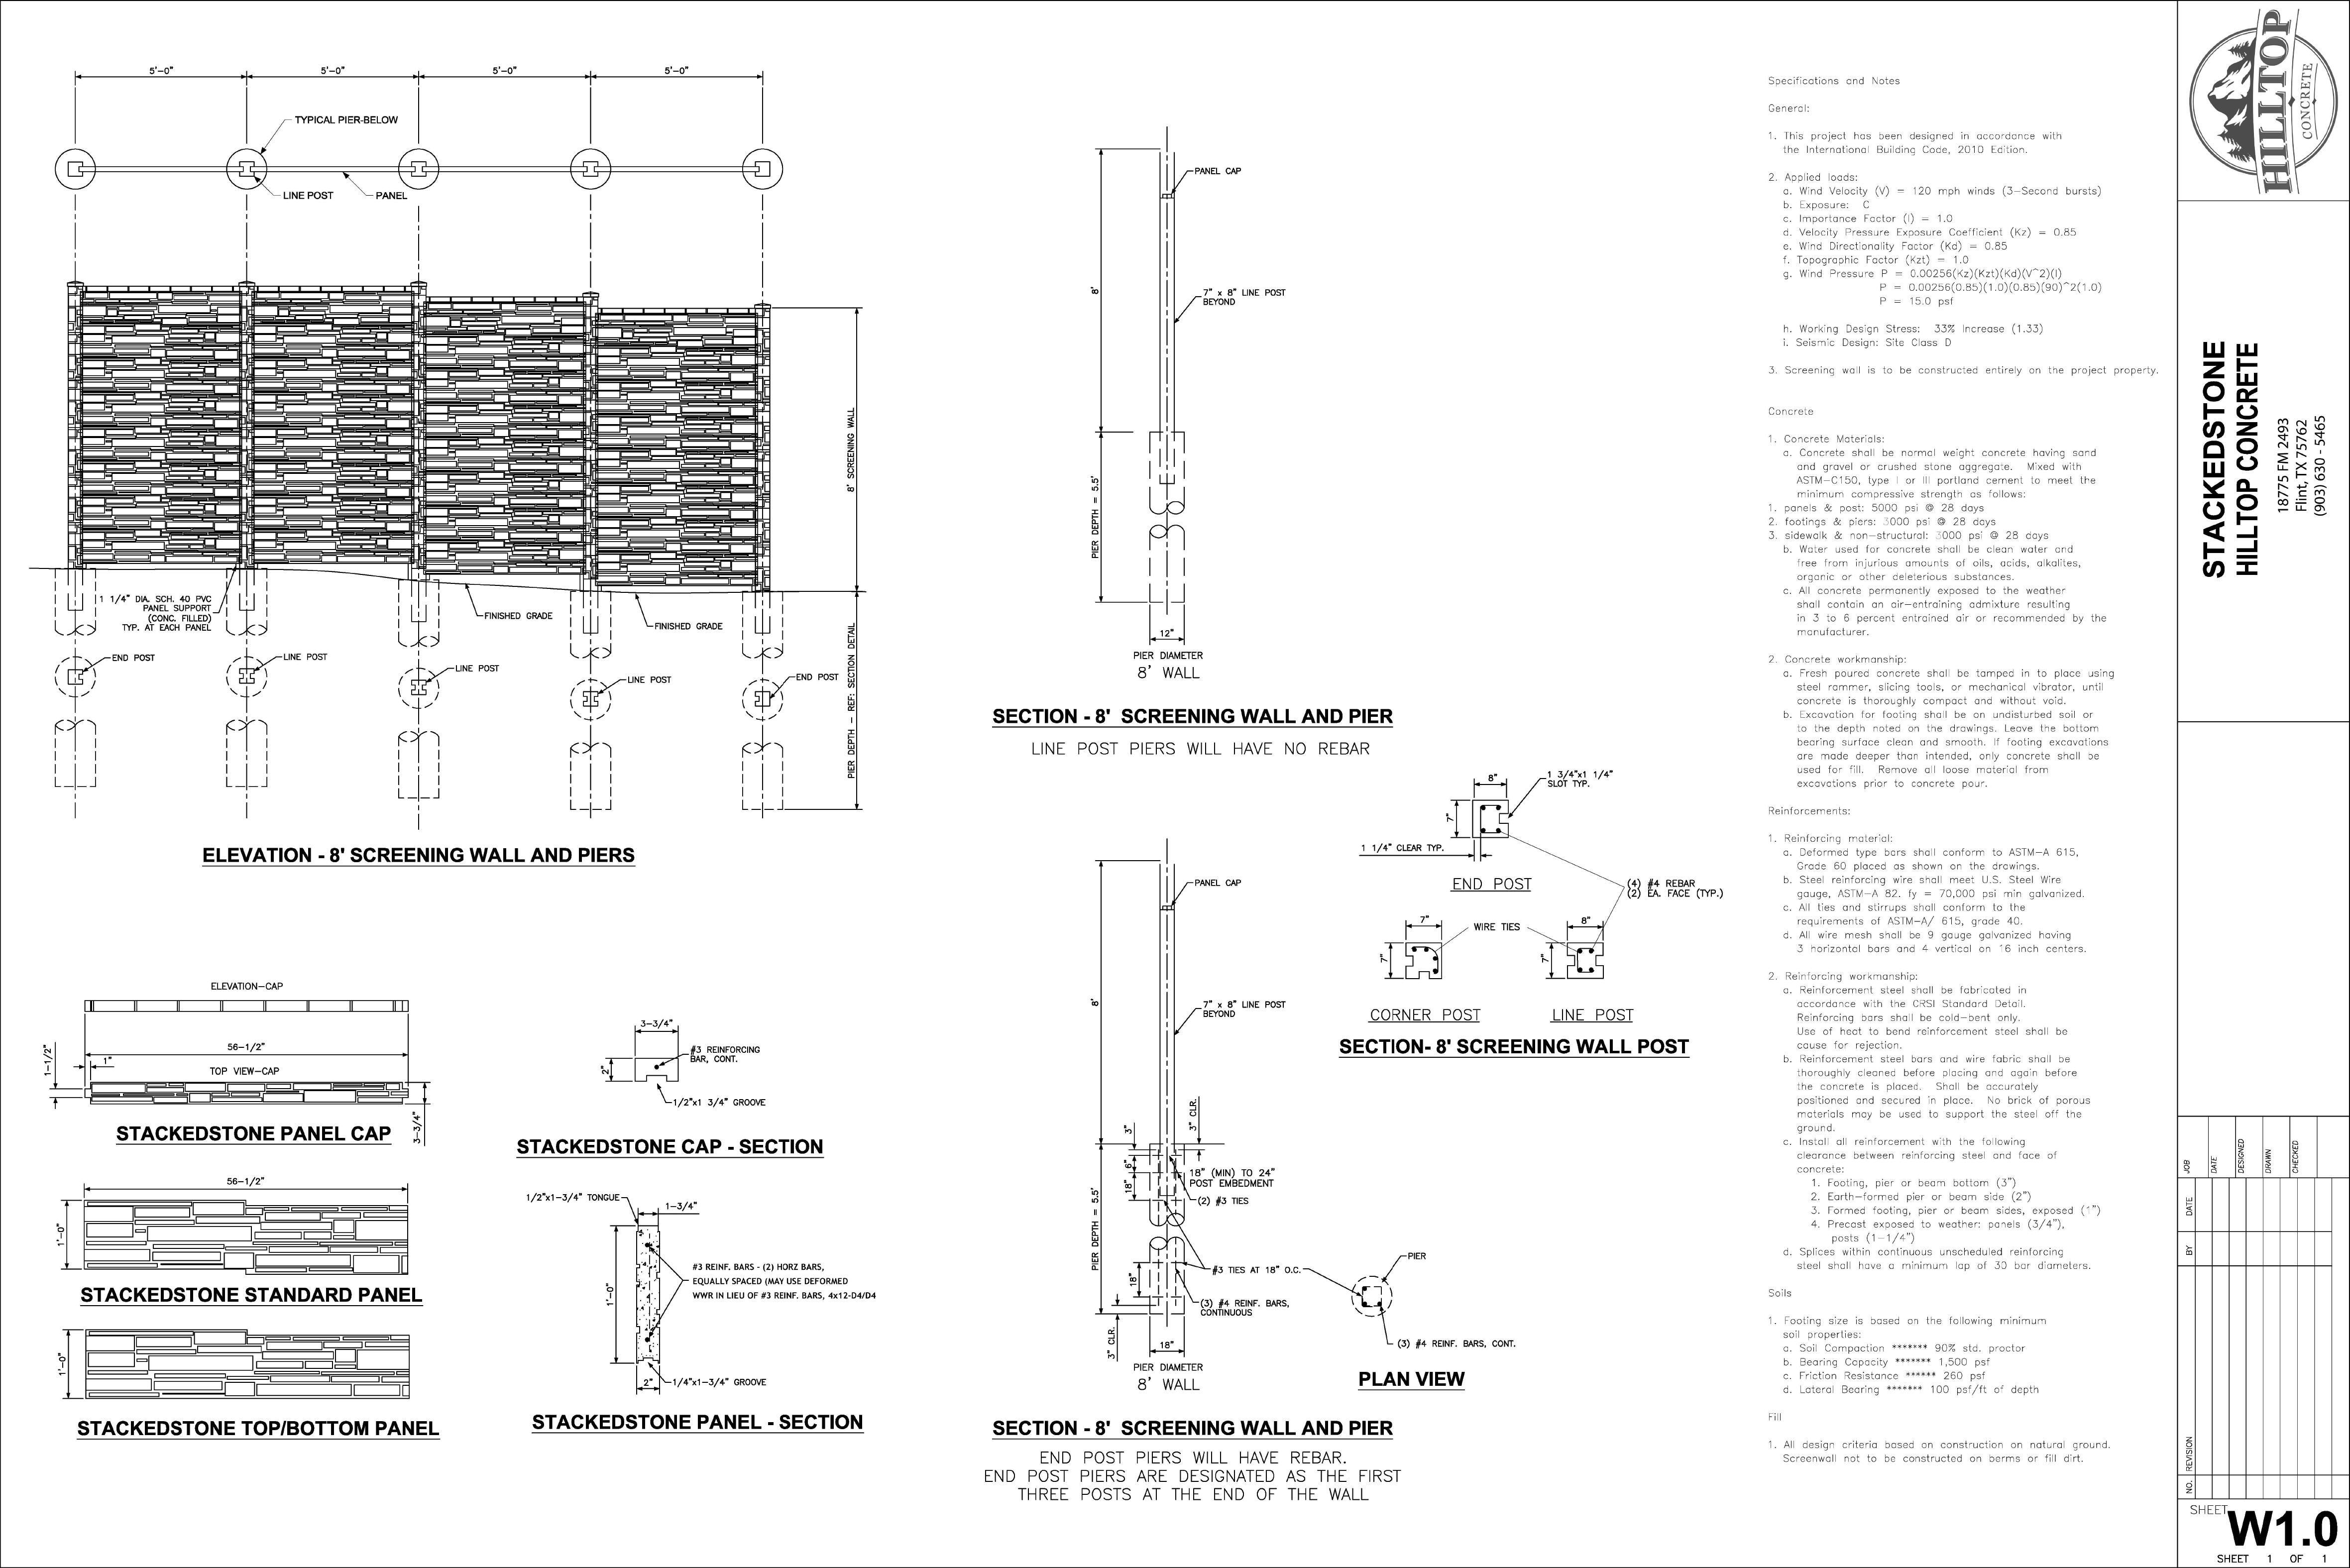 Hilltop Concrete - StackedStone 8ft - 2020 (1)